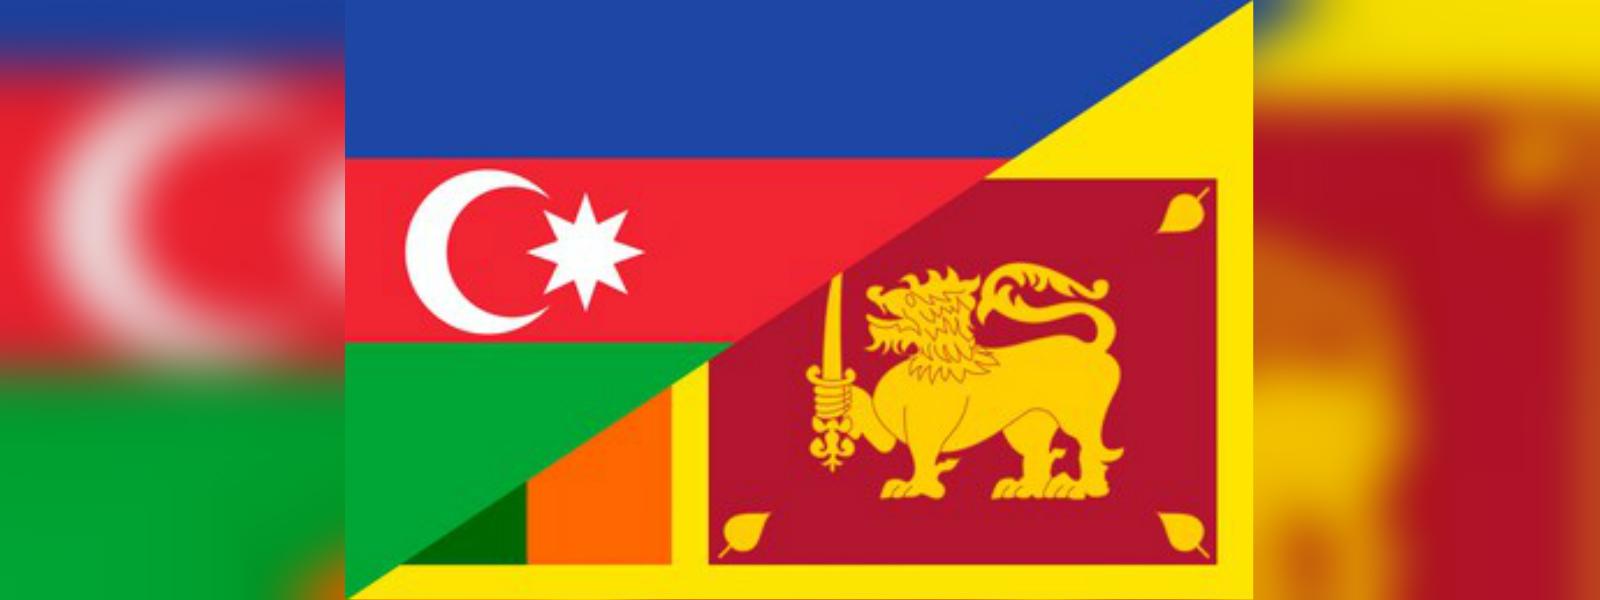 Sri Lanka and Azerbaijan discuss expanding cooperation